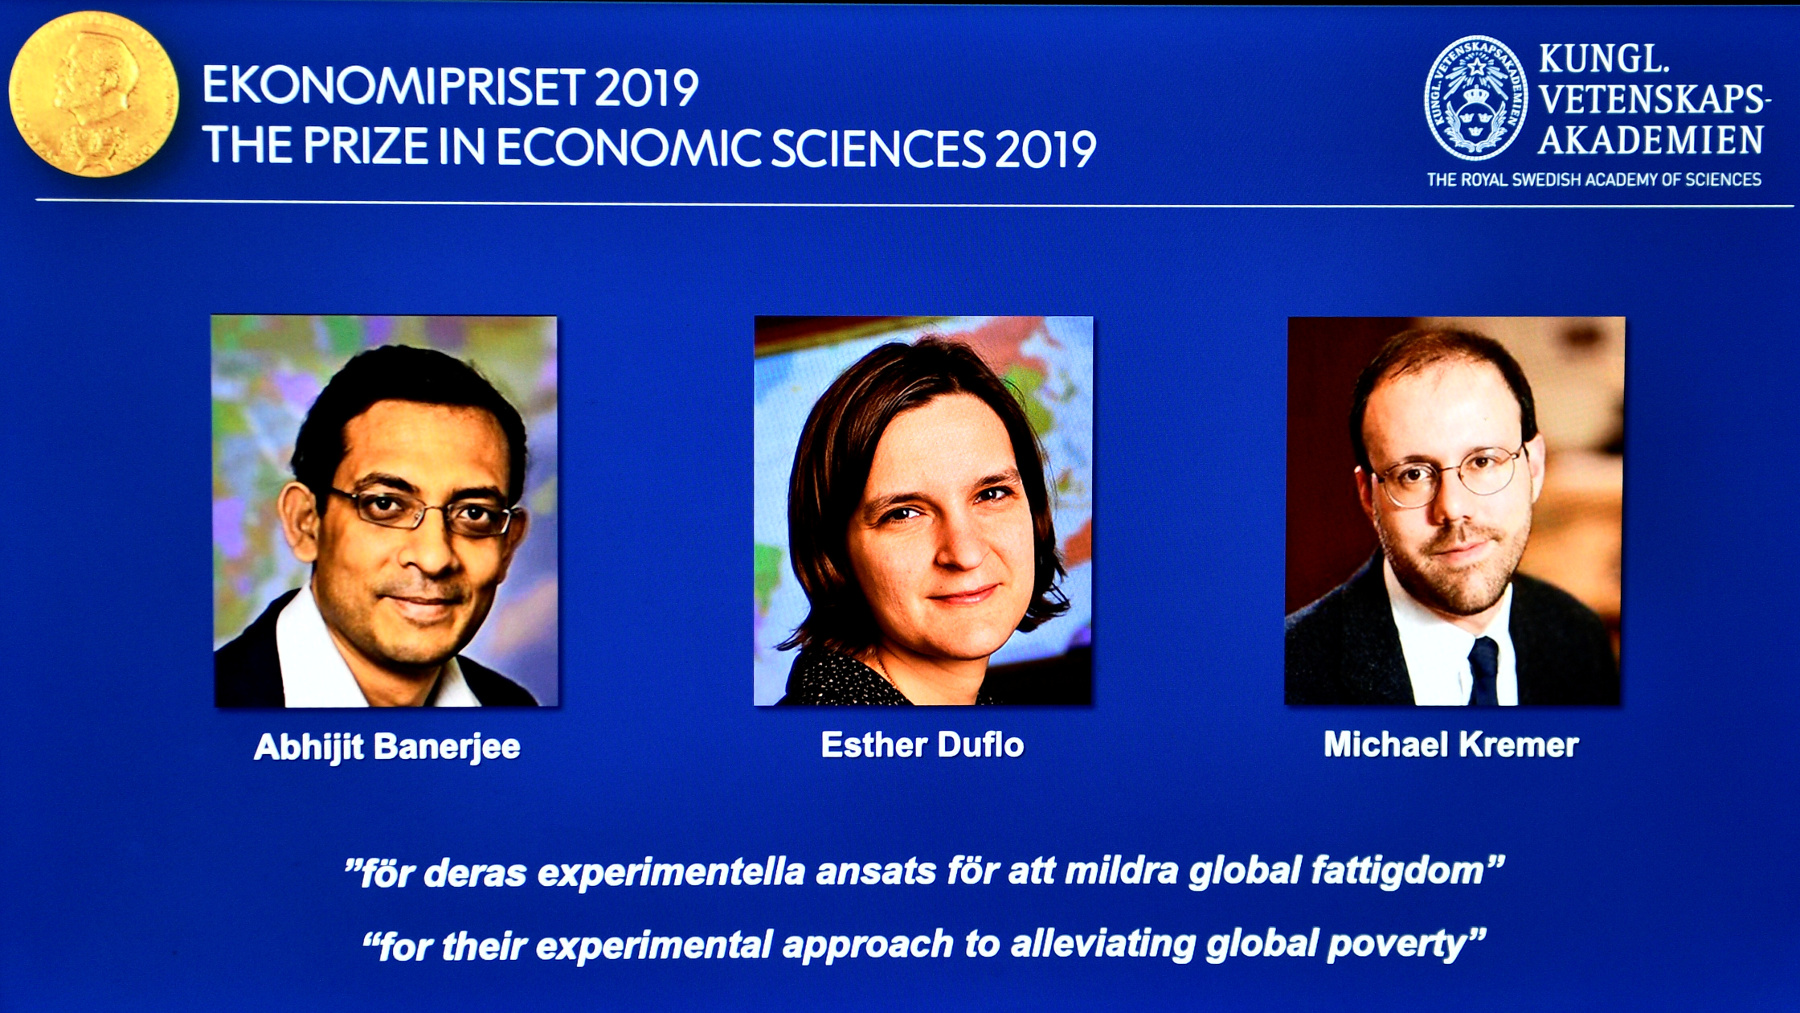 Abhijit Banerjee, Esther Duflo i Michael Kremer, dobitnici Nobelove nagrade za ekonomske znanosti za 2019. godinu